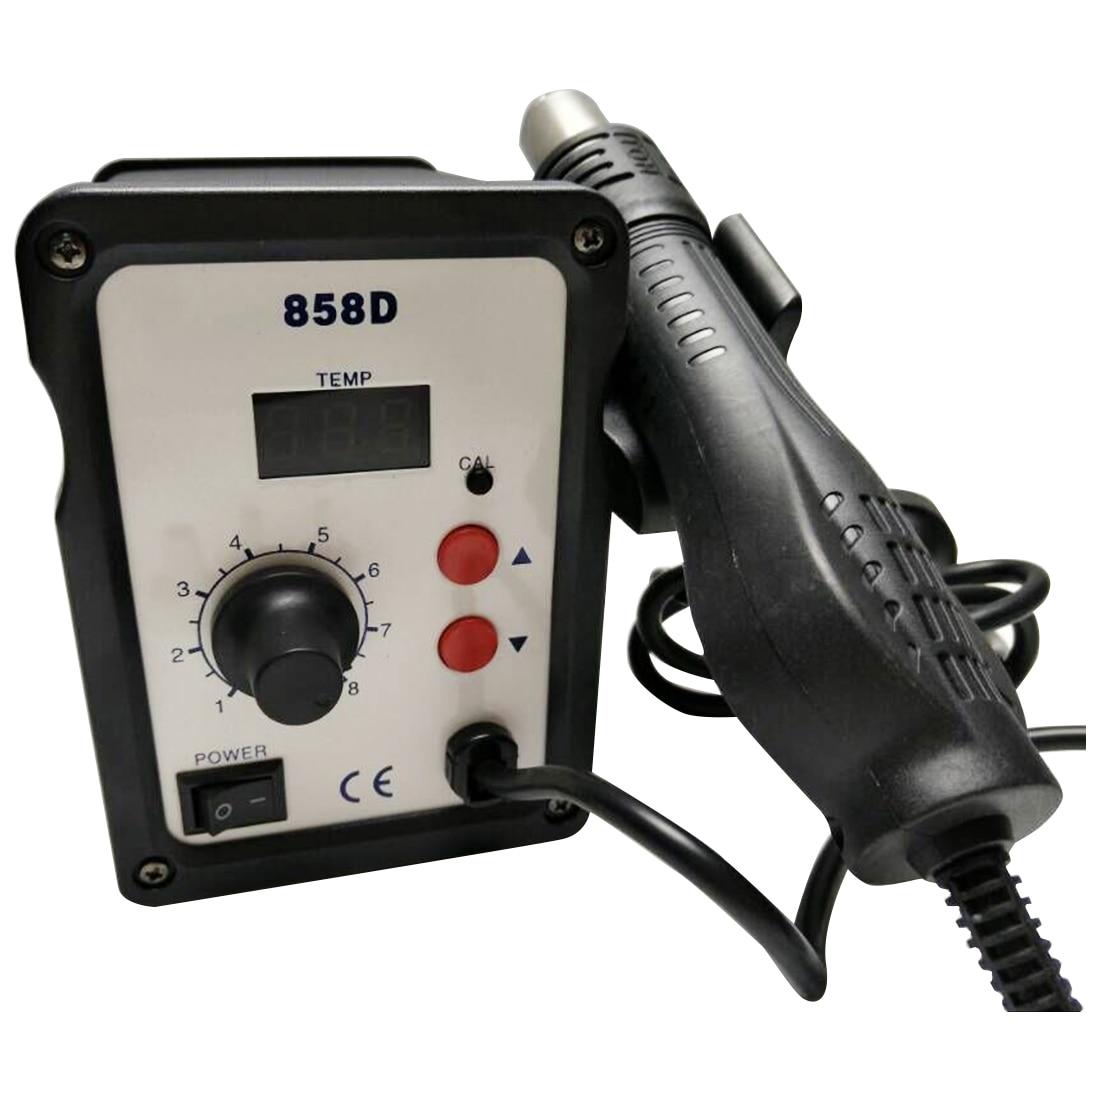 Retail 220V 240V 700W Hot Air Gun Desoldering Soldering Rework SMD Station 3 Nozzles for SMD